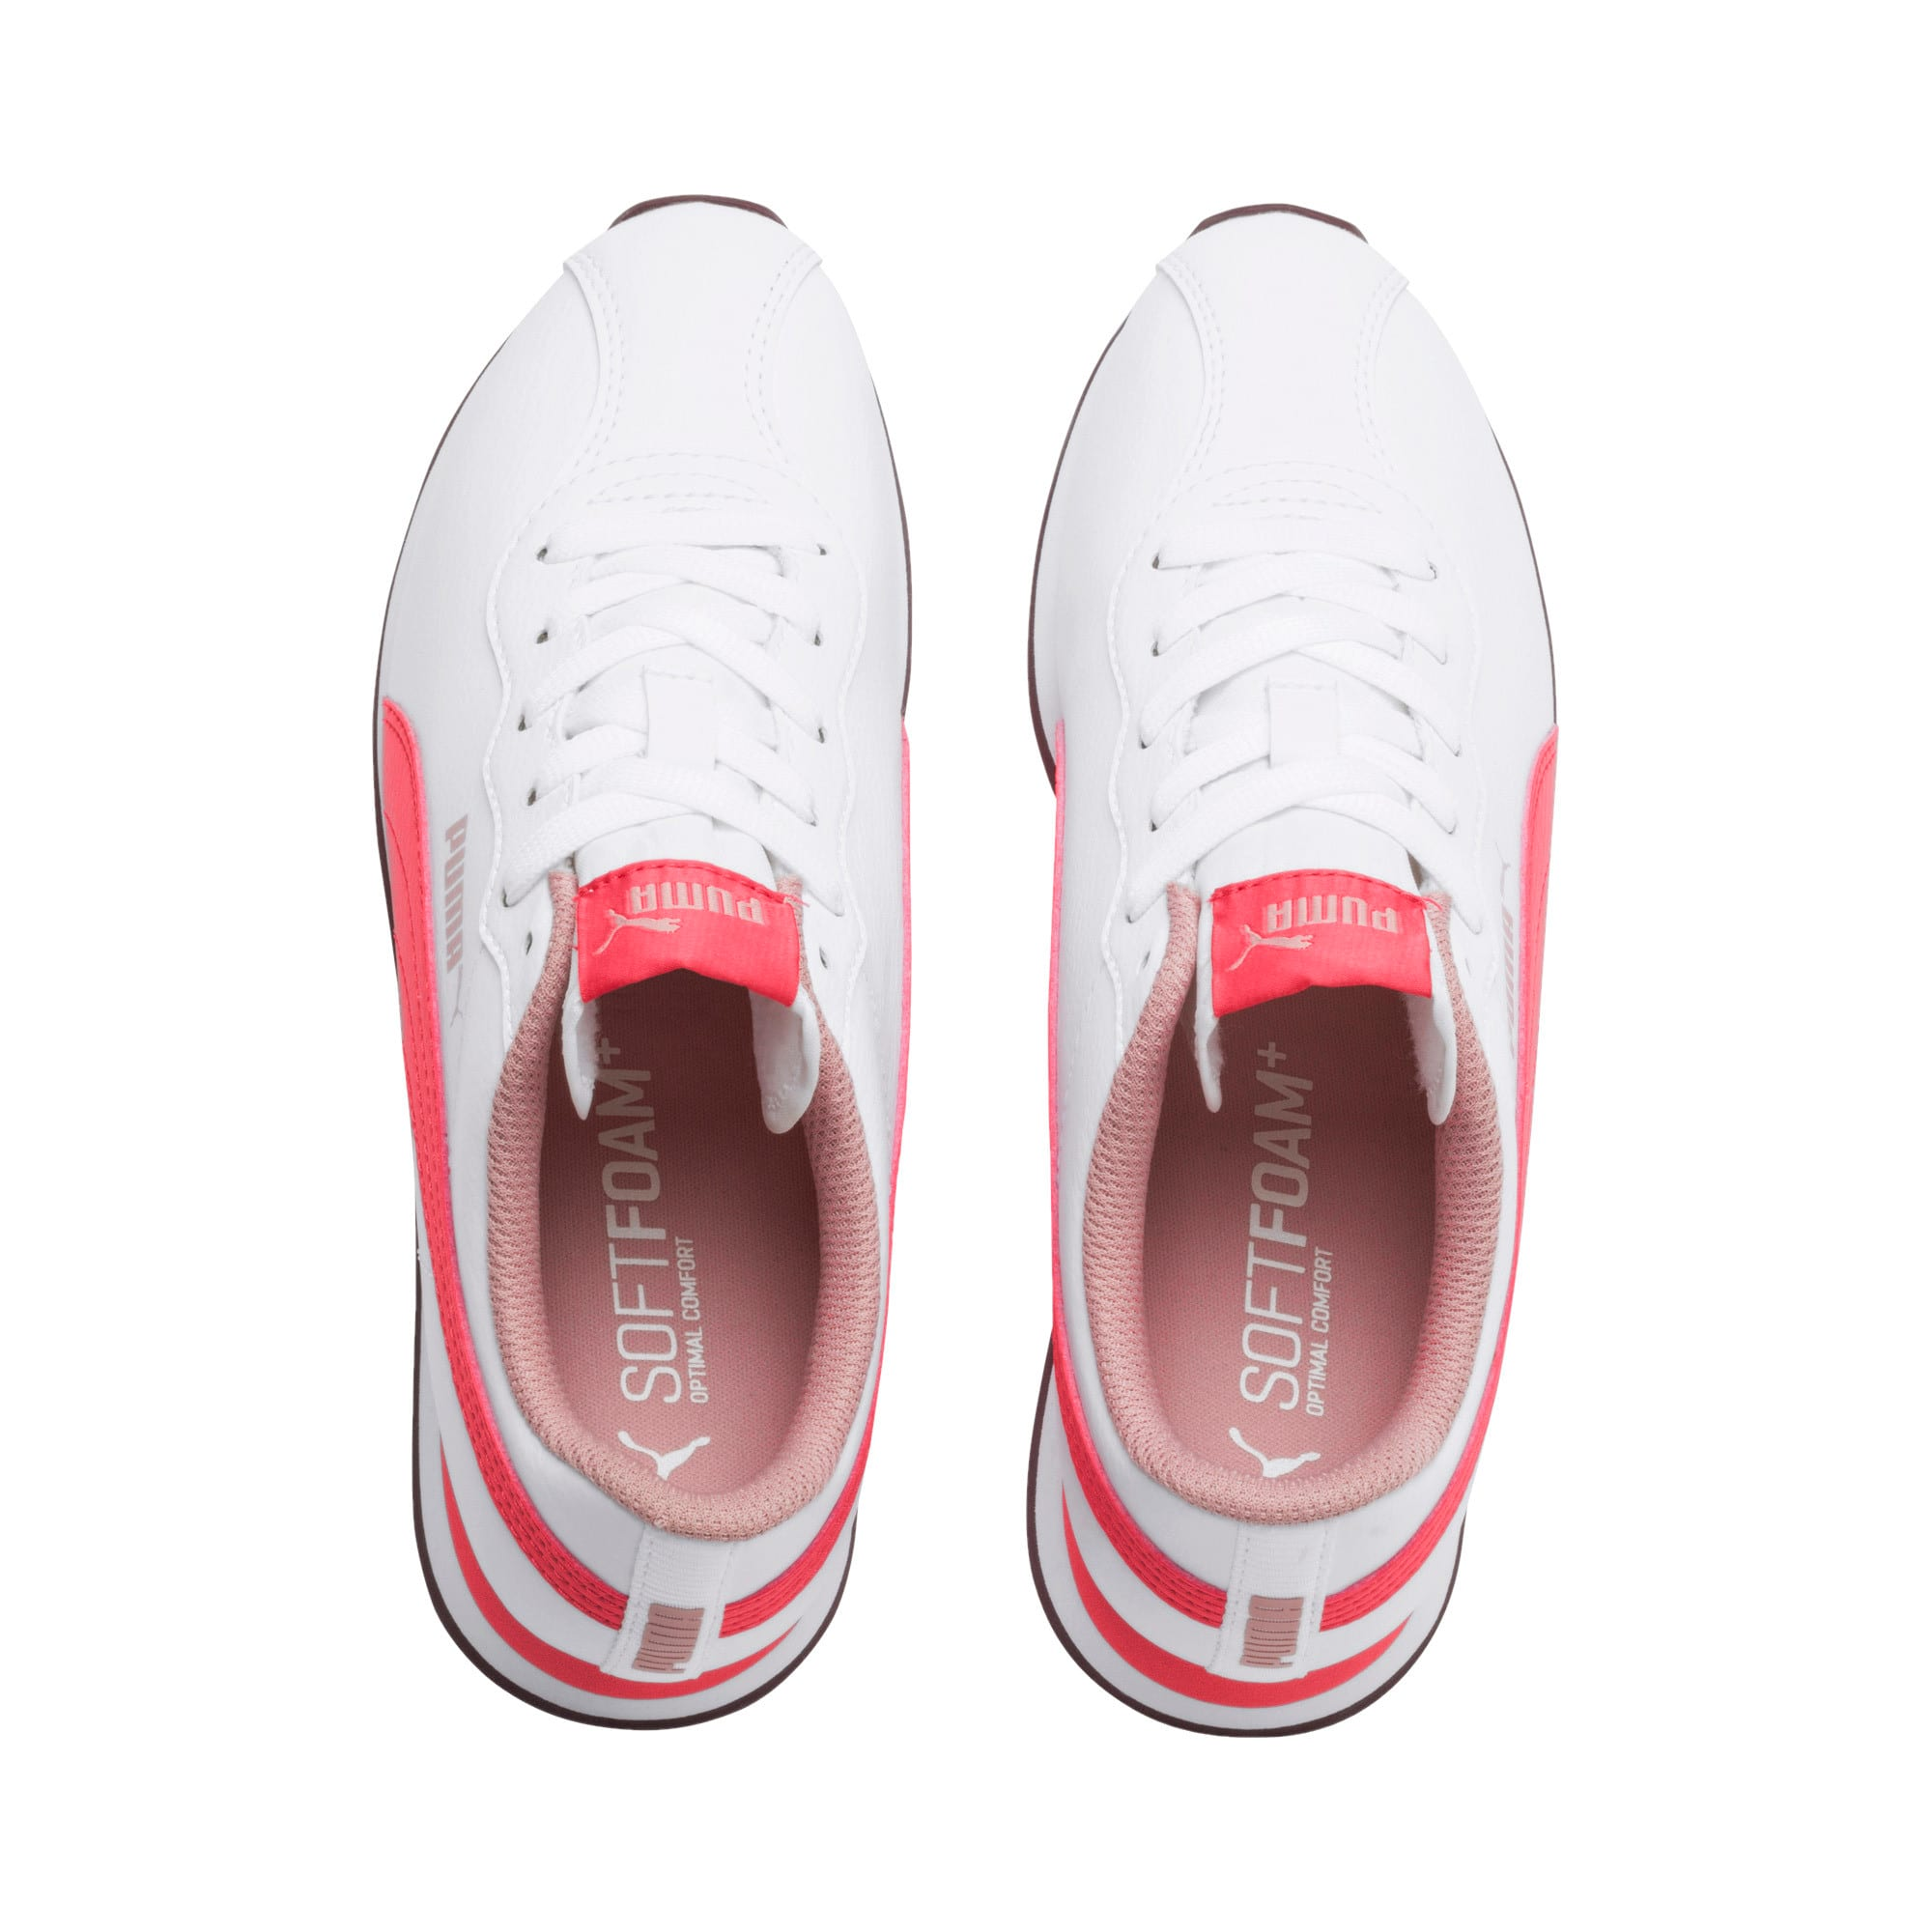 Miniatura 6 de Zapatos deportivos Turin II para JR, Puma White-Calypso Coral, mediano